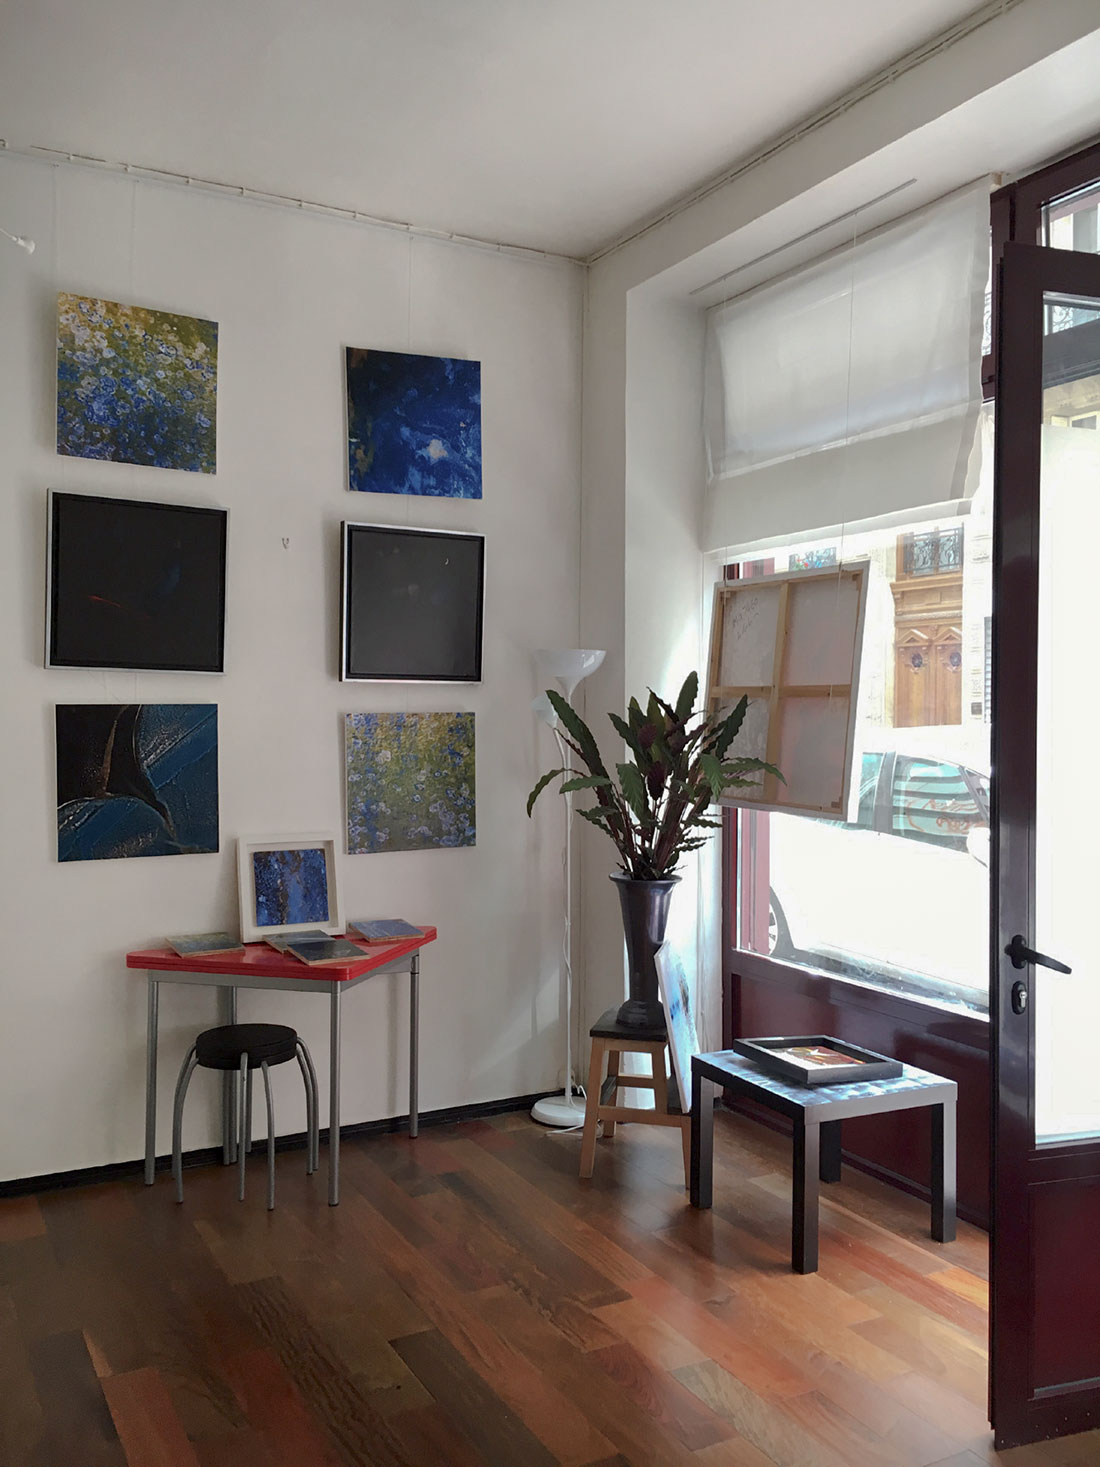 GalleryArt.C